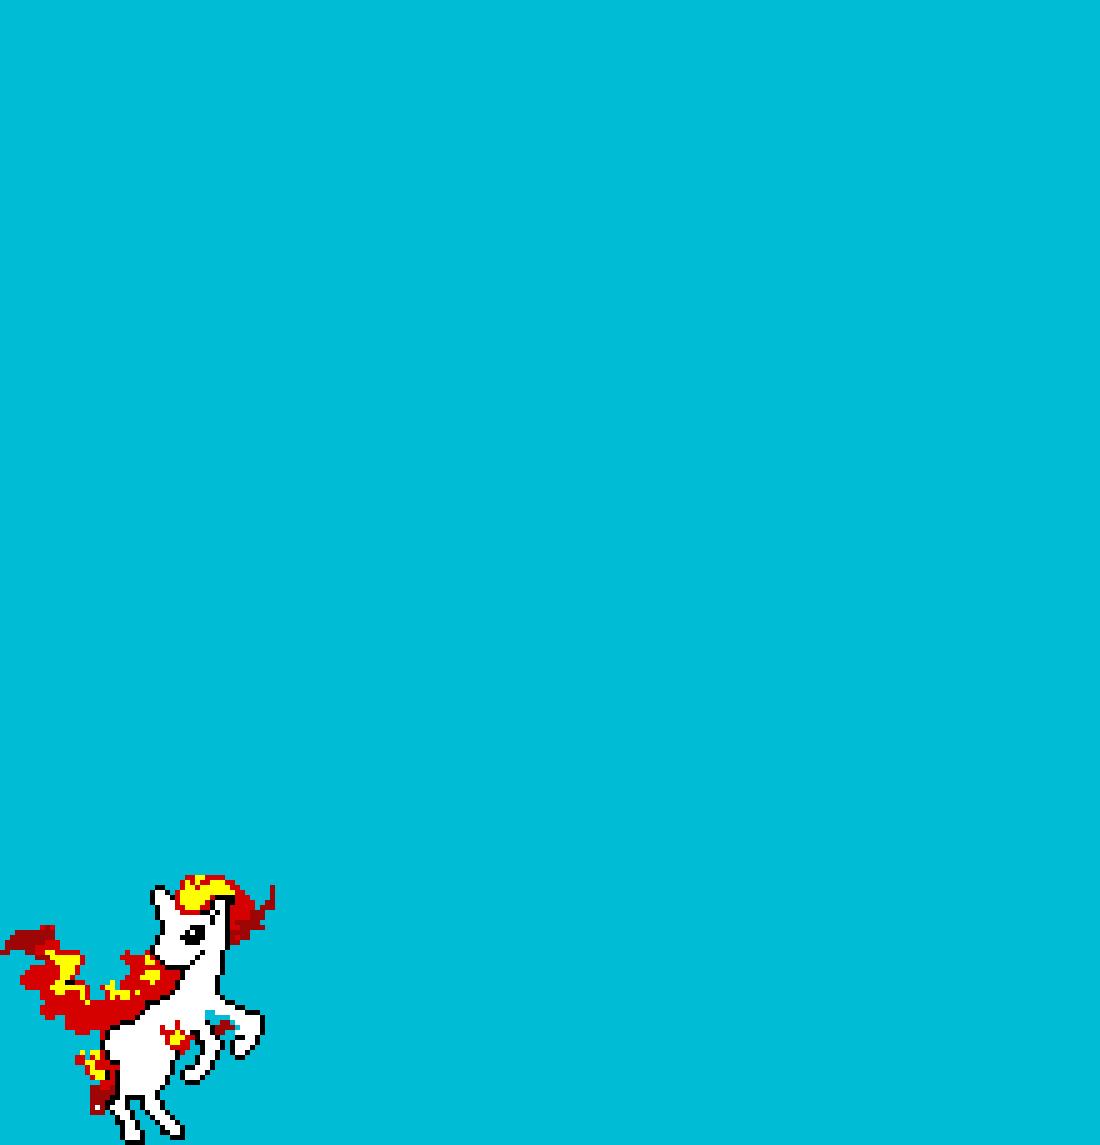 main-image-fff  by art-cat